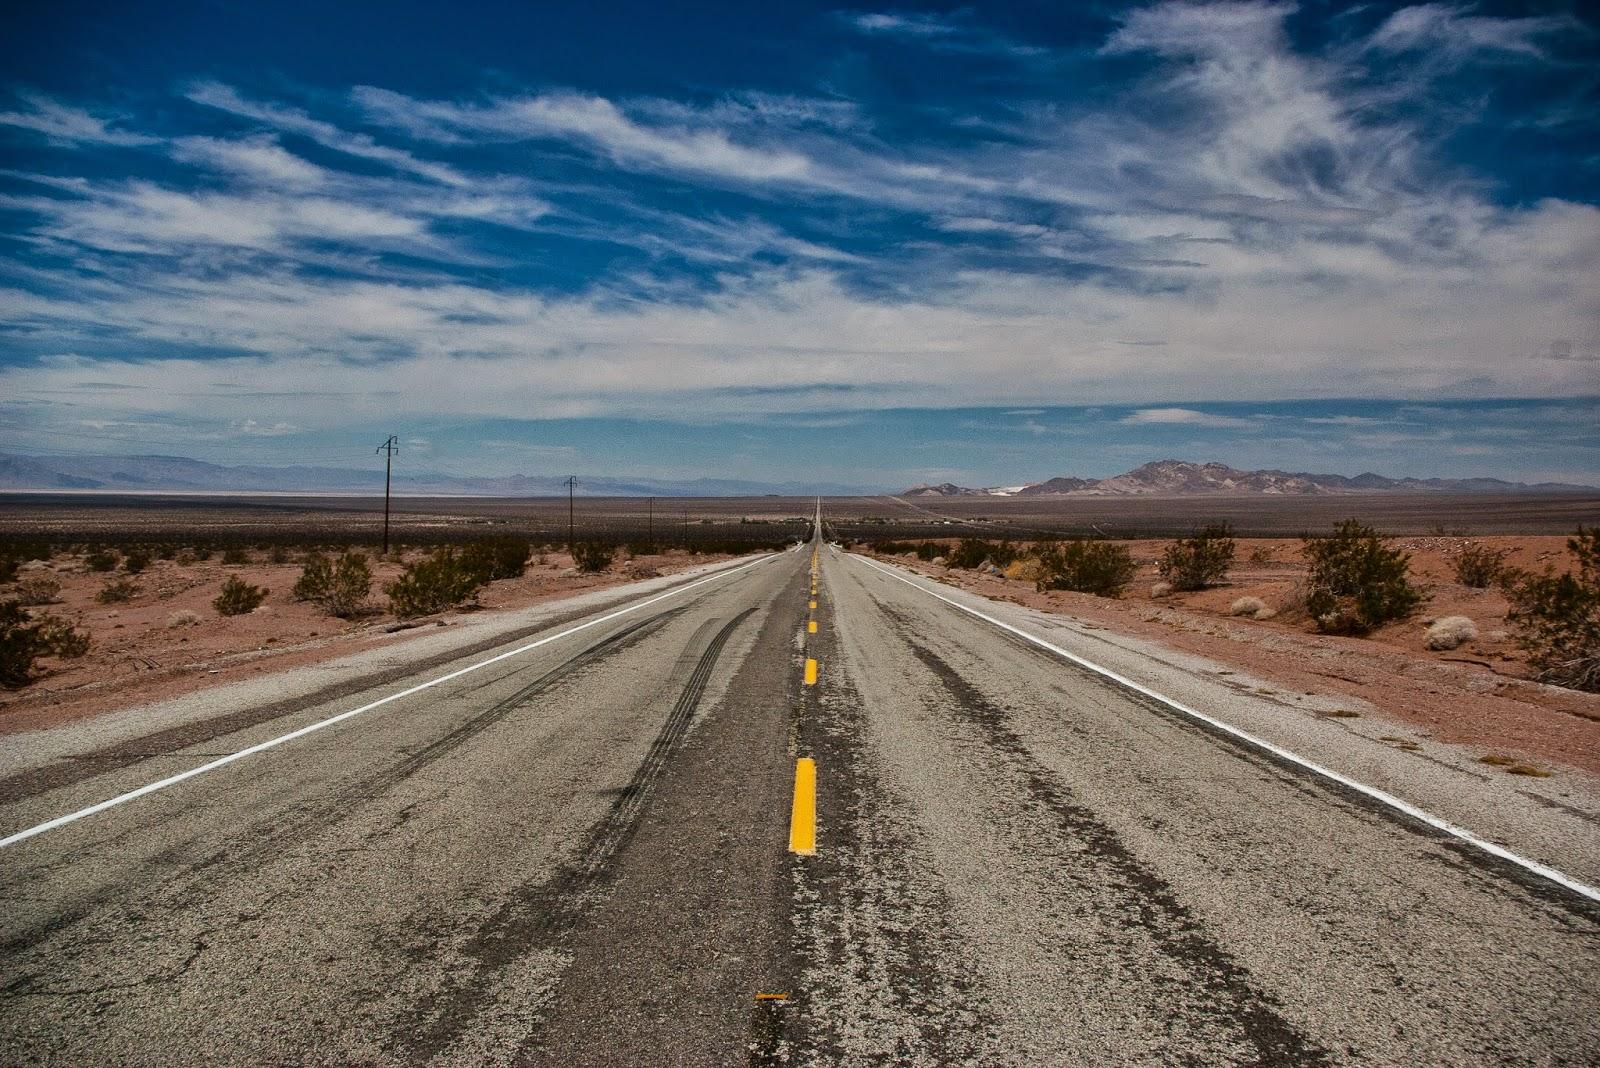 Fantasy Road Trips - Dallas to San Francisco, via the Loneliest Road.